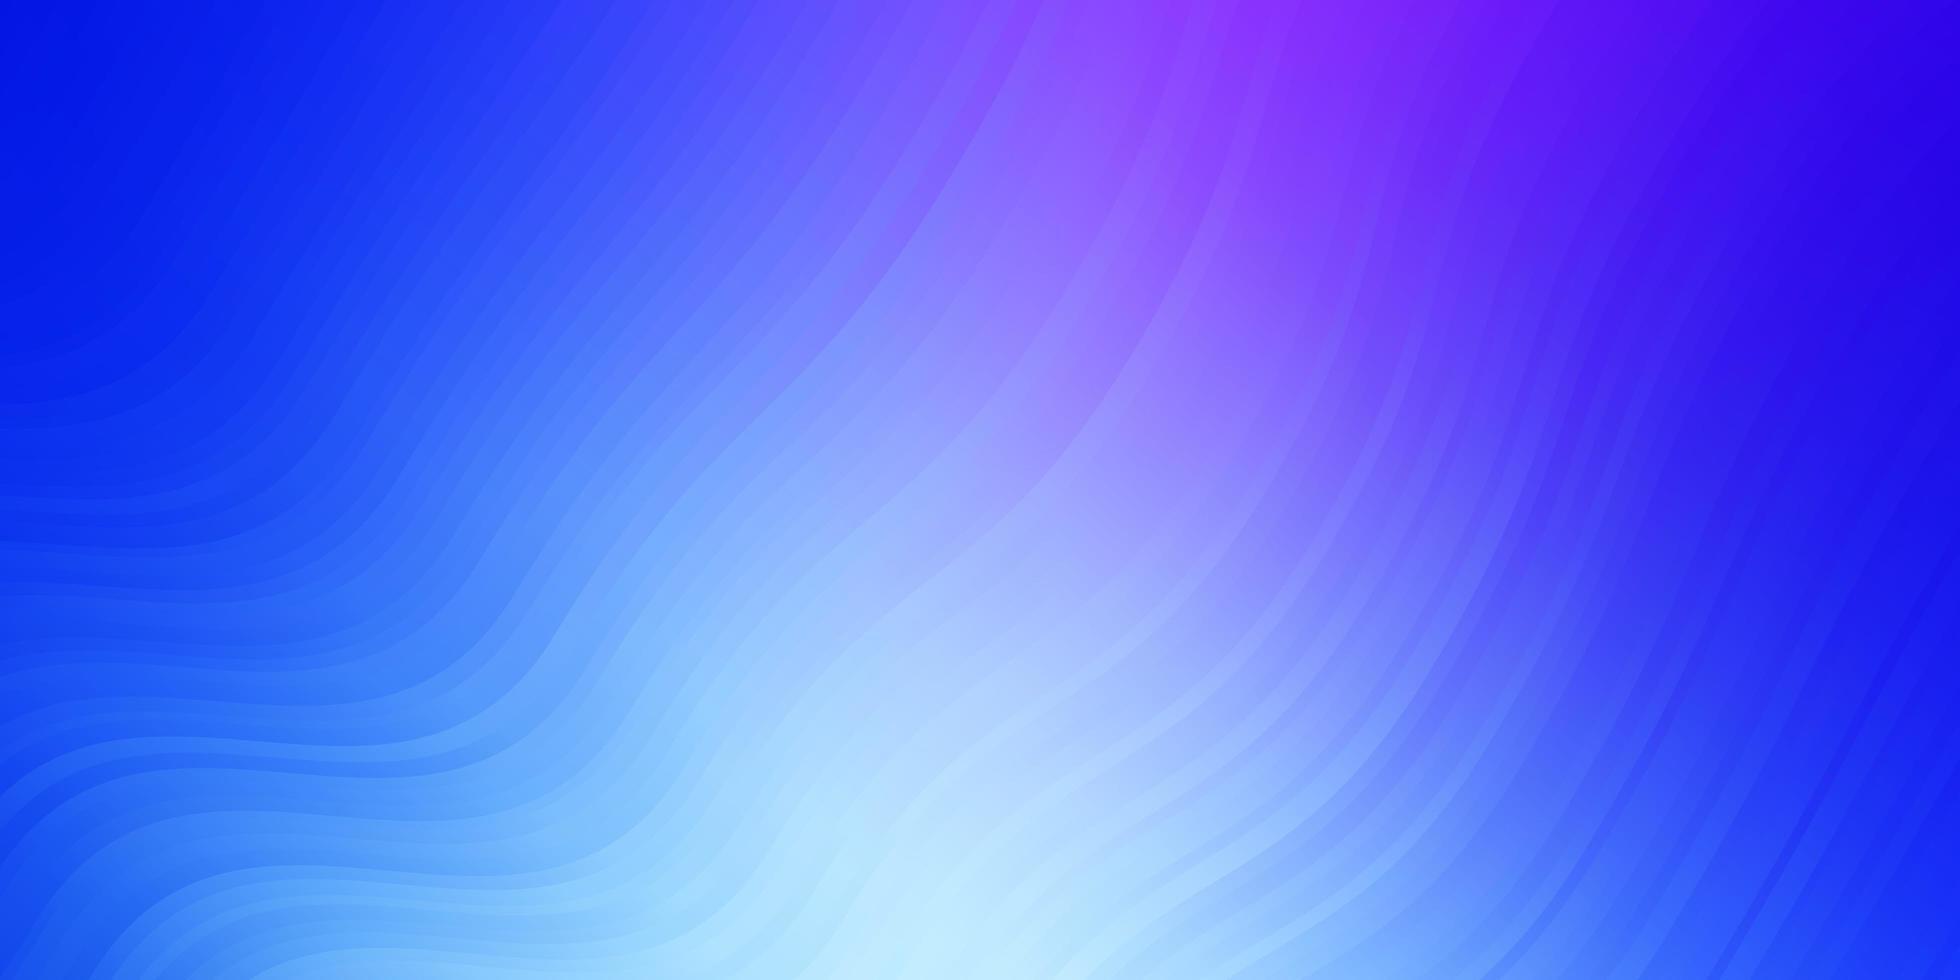 hellrosa, blaues Vektormuster mit gekrümmten Linien. vektor